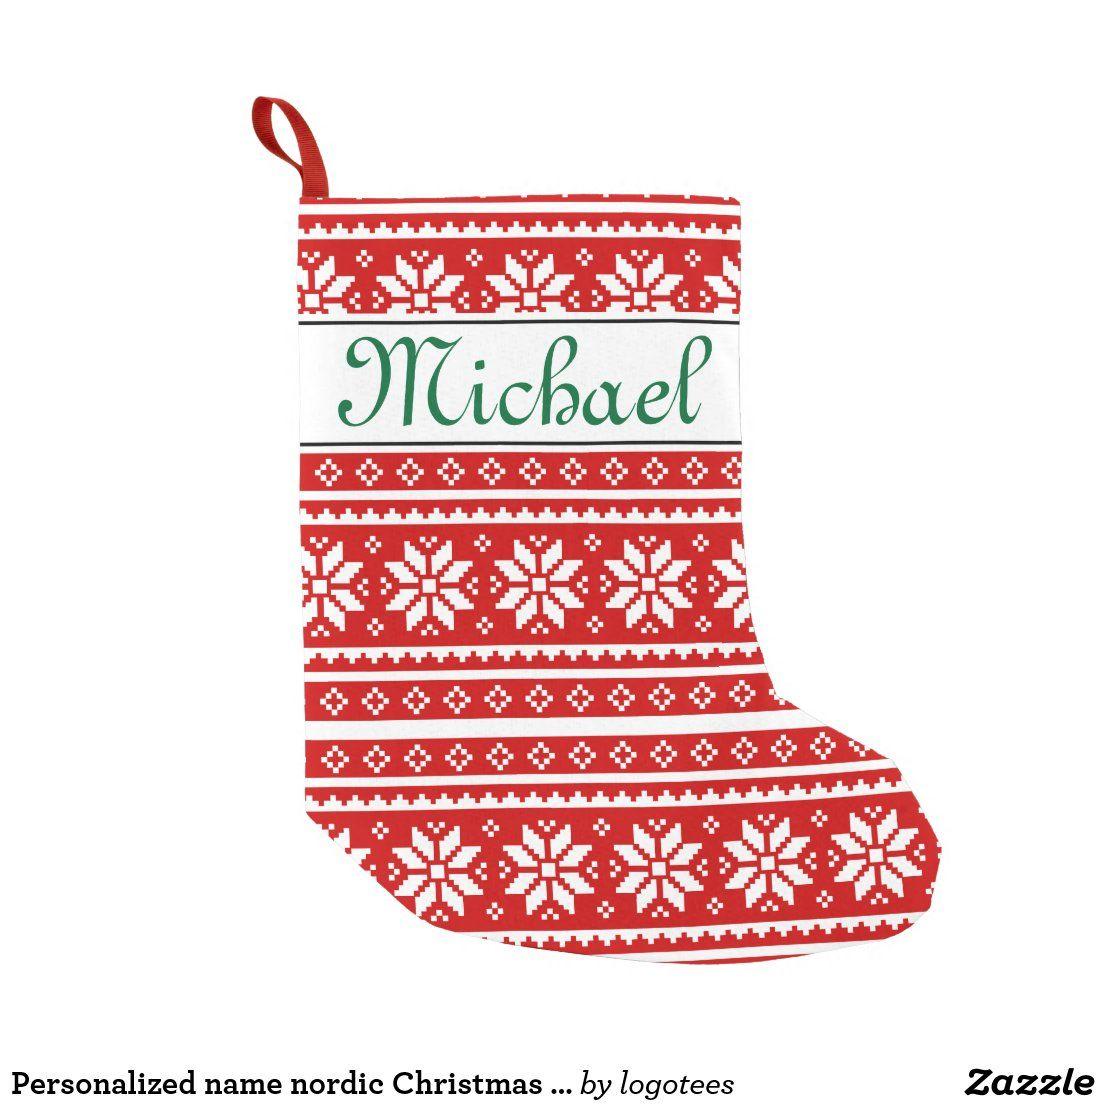 Personalized Name Nordic Christmas Stocking Zazzle Com Christmas Stockings Nordic Christmas Personalized Stockings